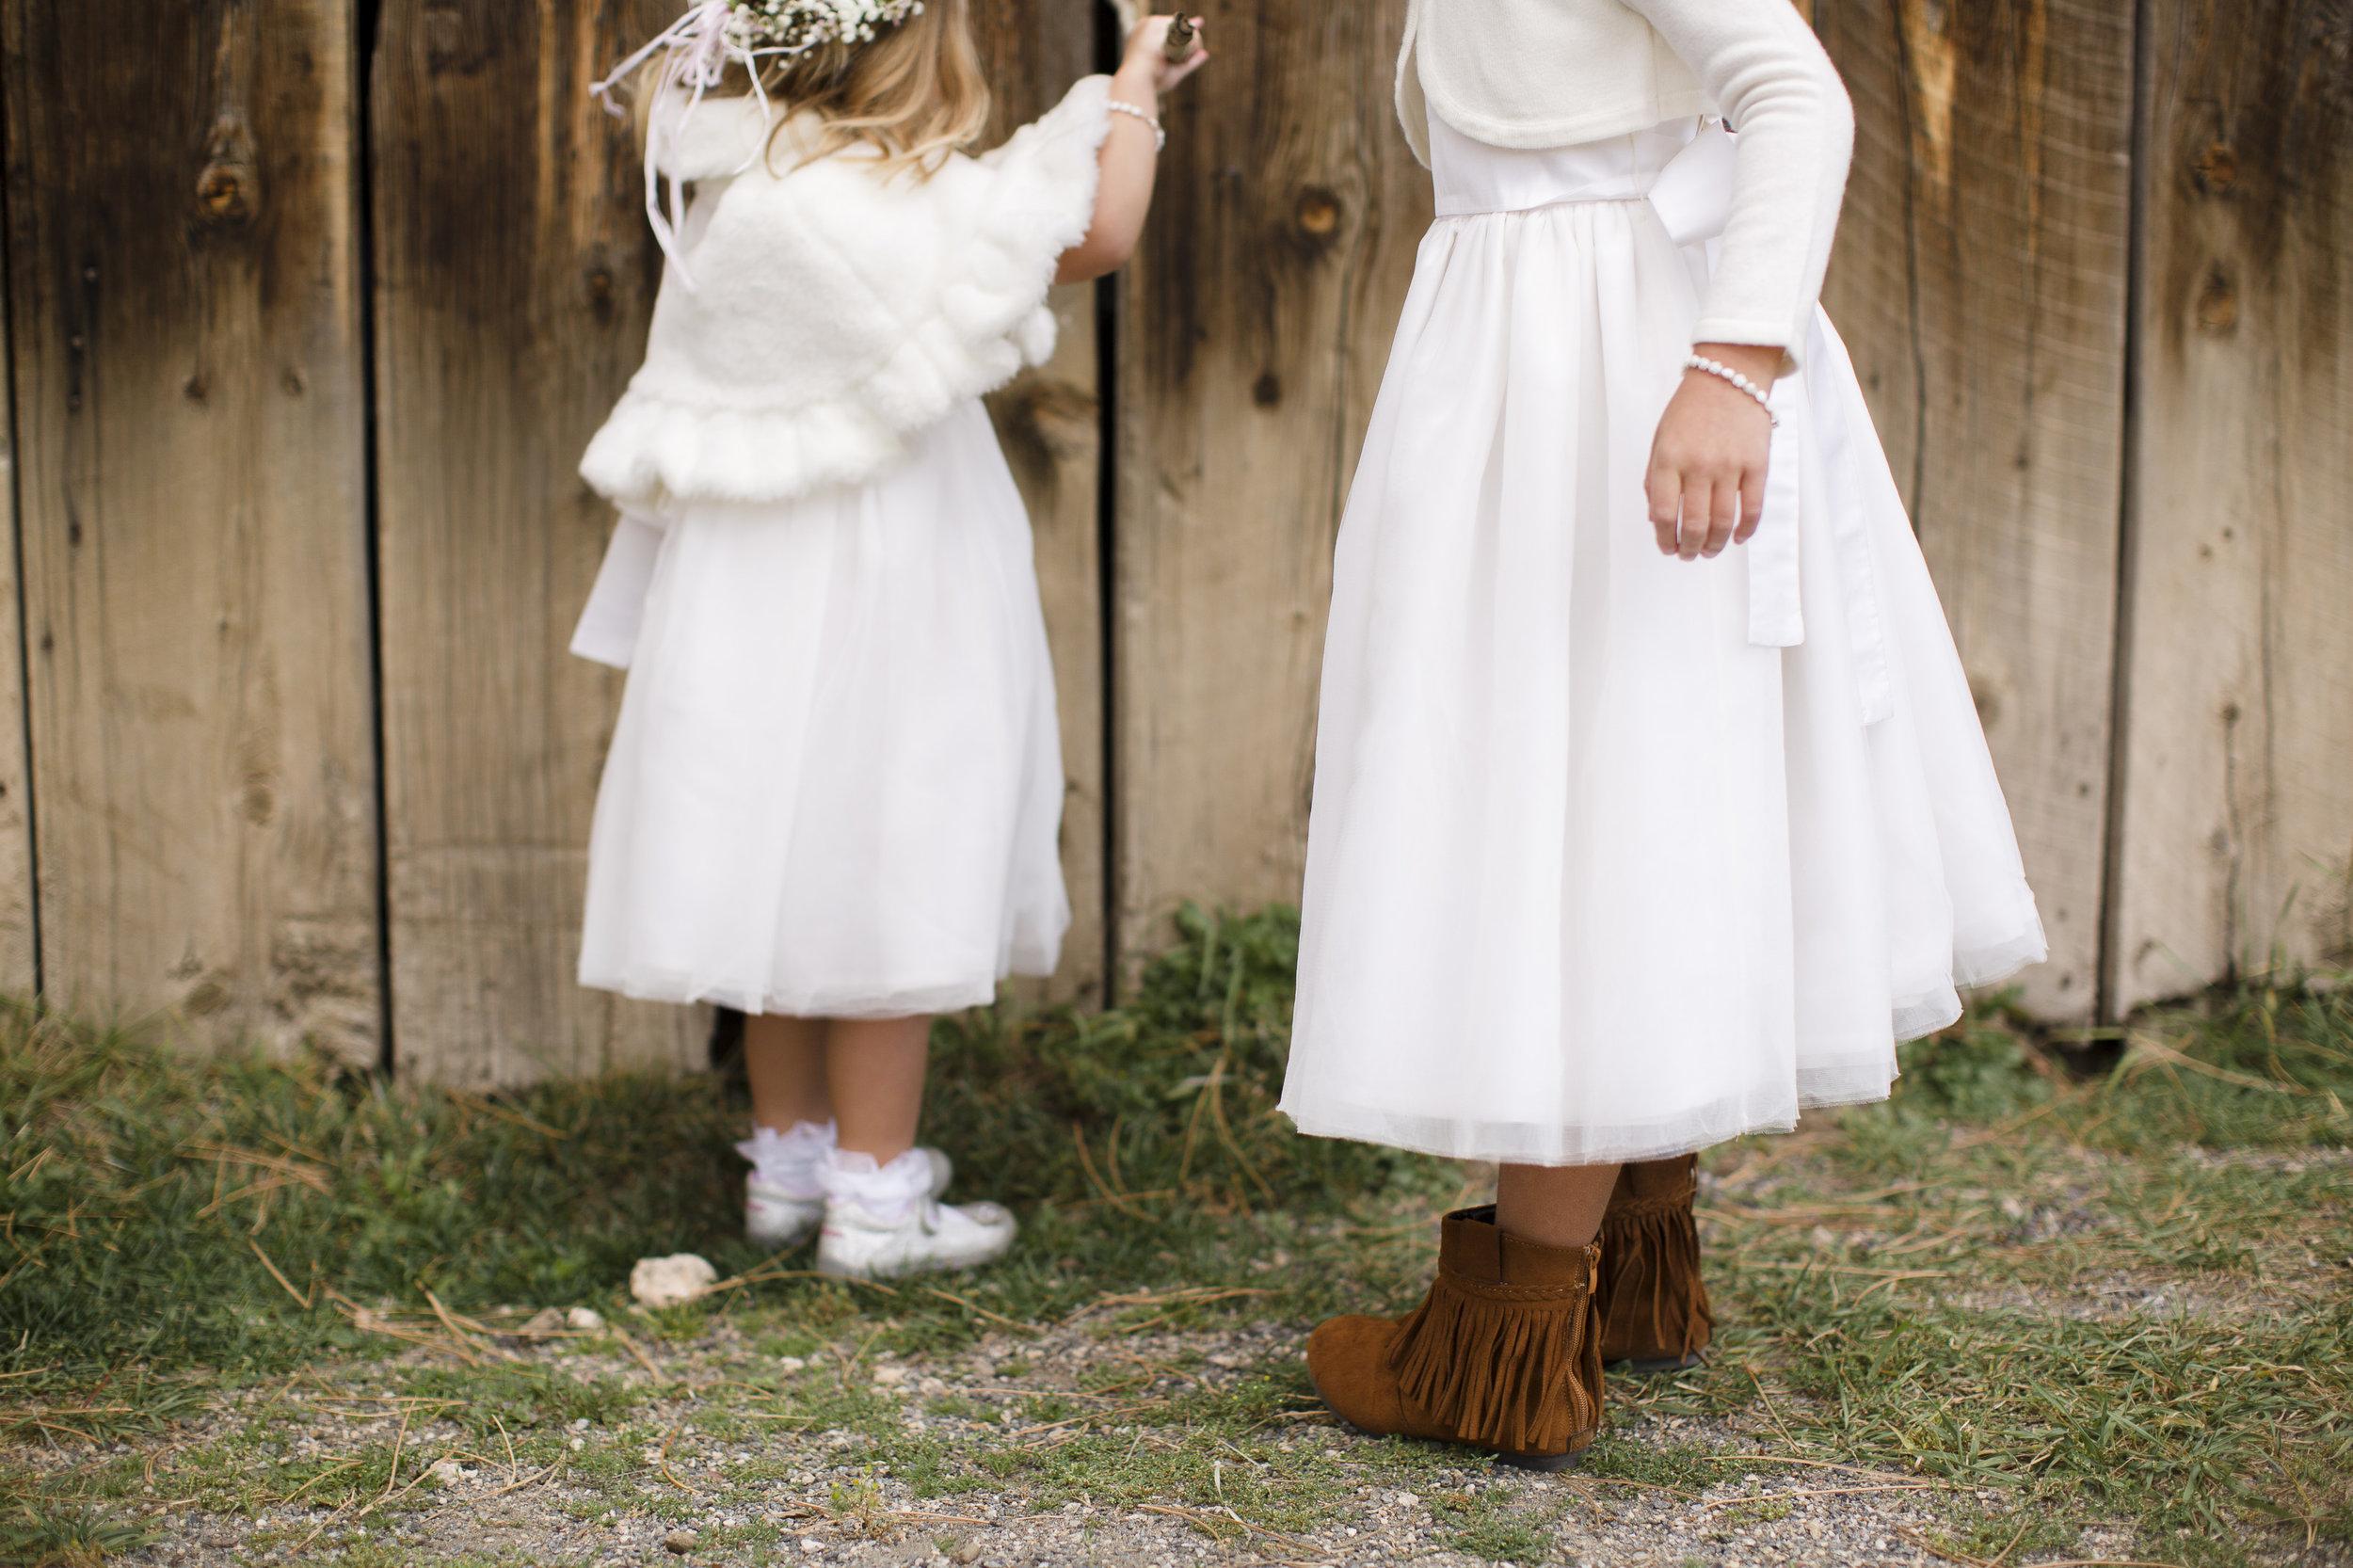 kristen-vance-three-sisters-barn-evergreen-colorado-wedding-2017-3.jpg